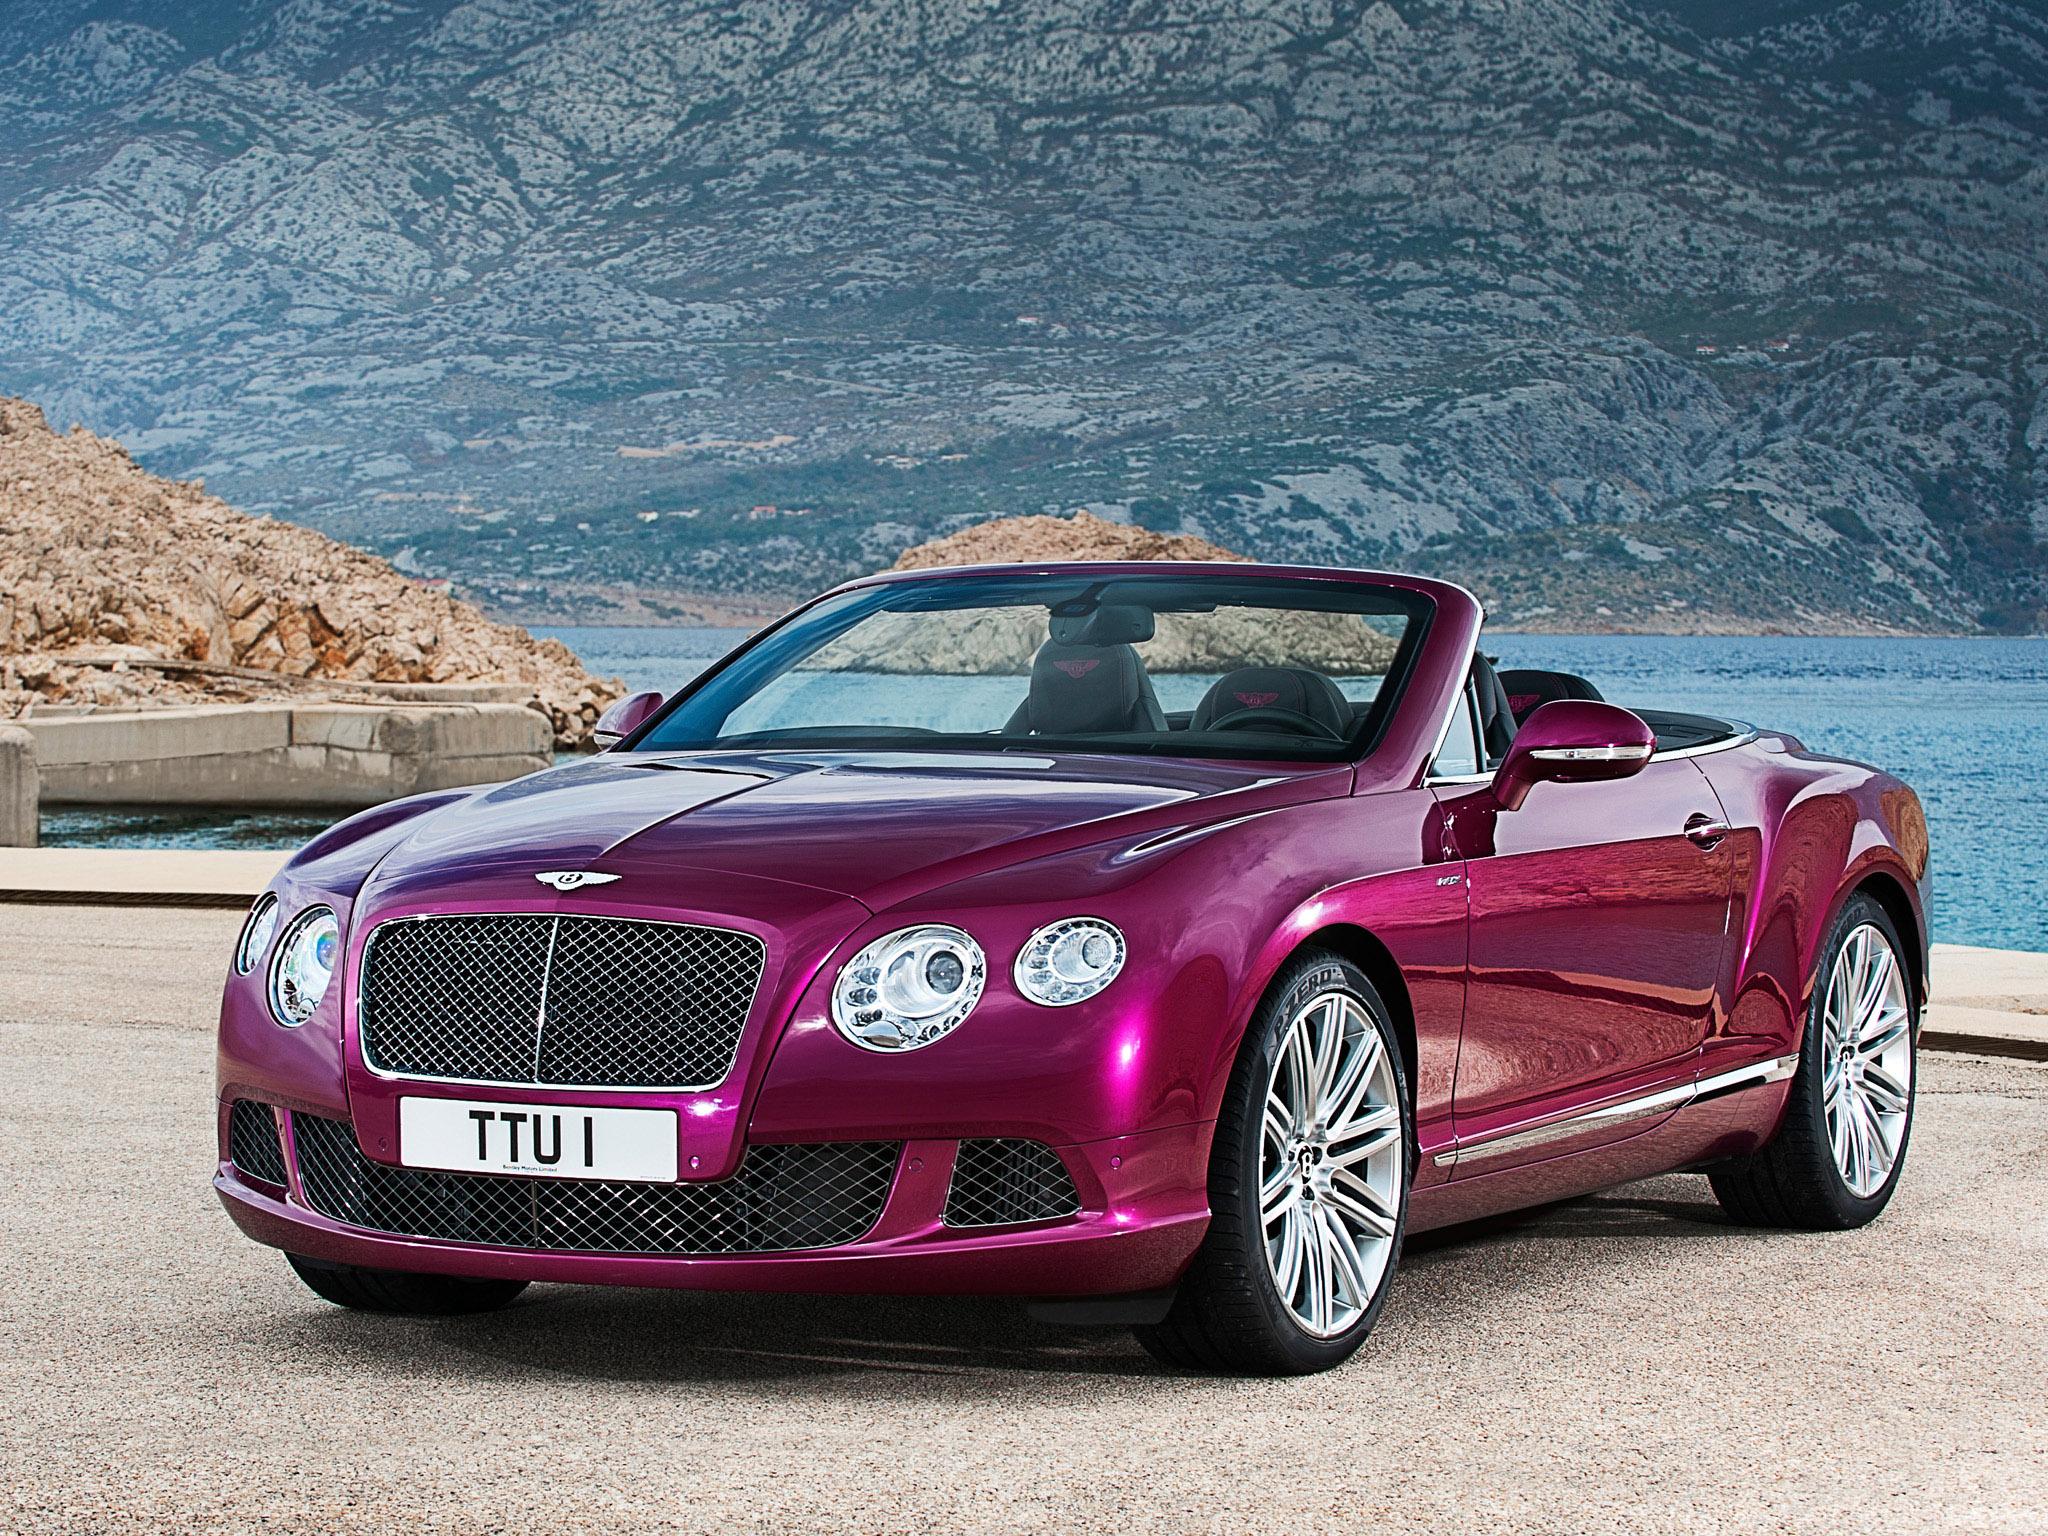 Bentley Continental GT Speed Convertible photo #1